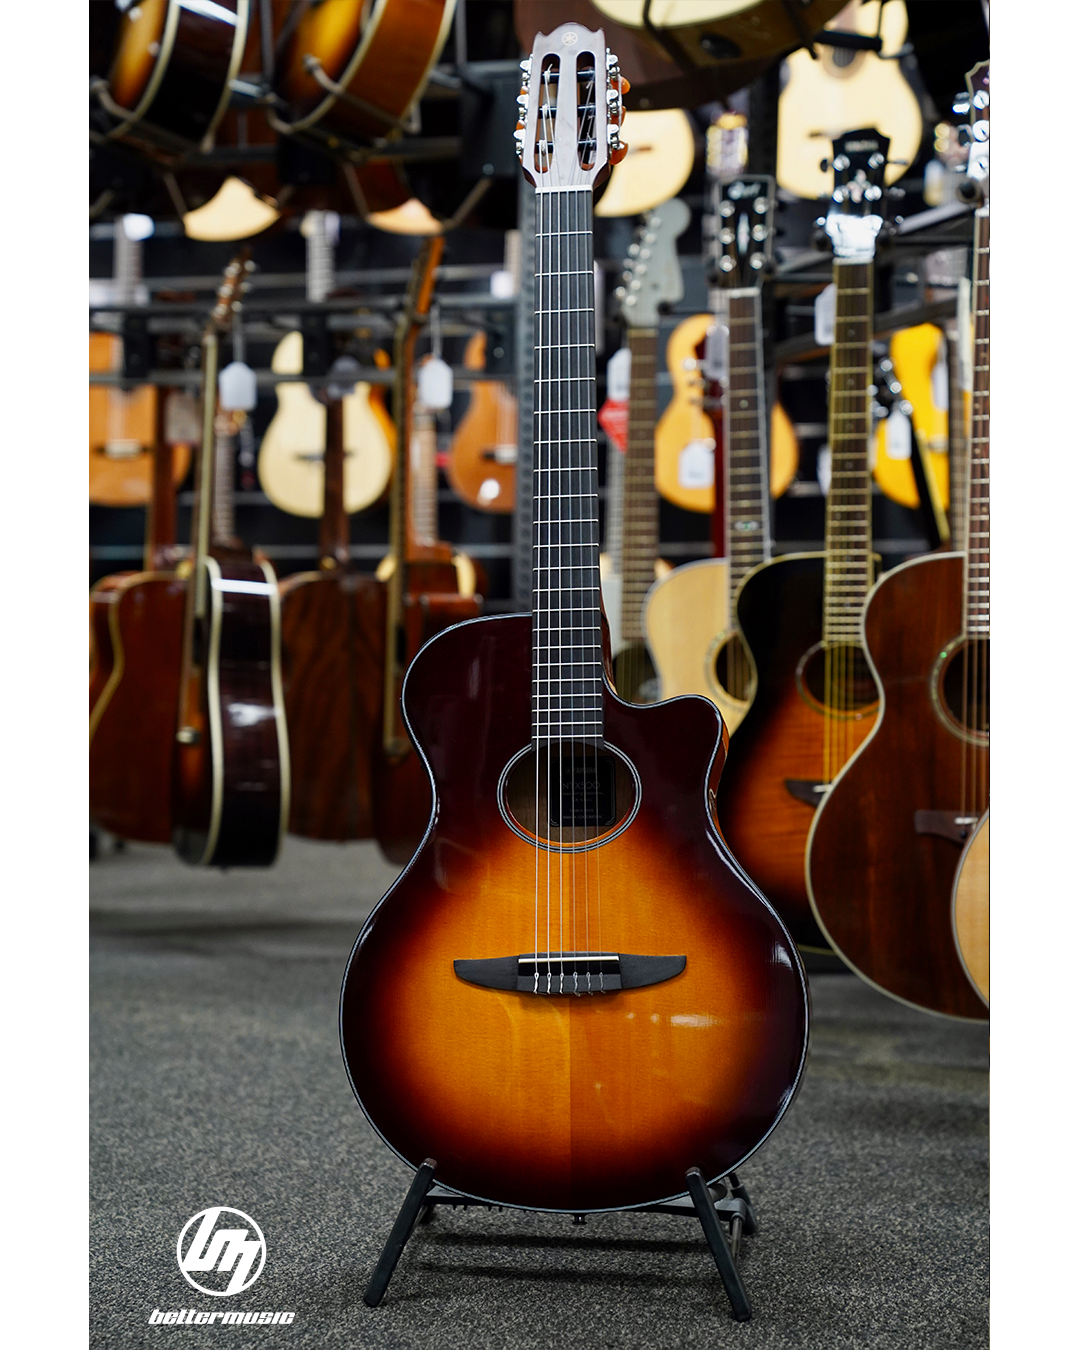 Yamaha Ntx500bs Classical Electric Guitar Brown Sunburst Yamahaguitars Talentcentral Coleclark Cort Crafter Yamaha Guitar Guitar Guitar For Beginners